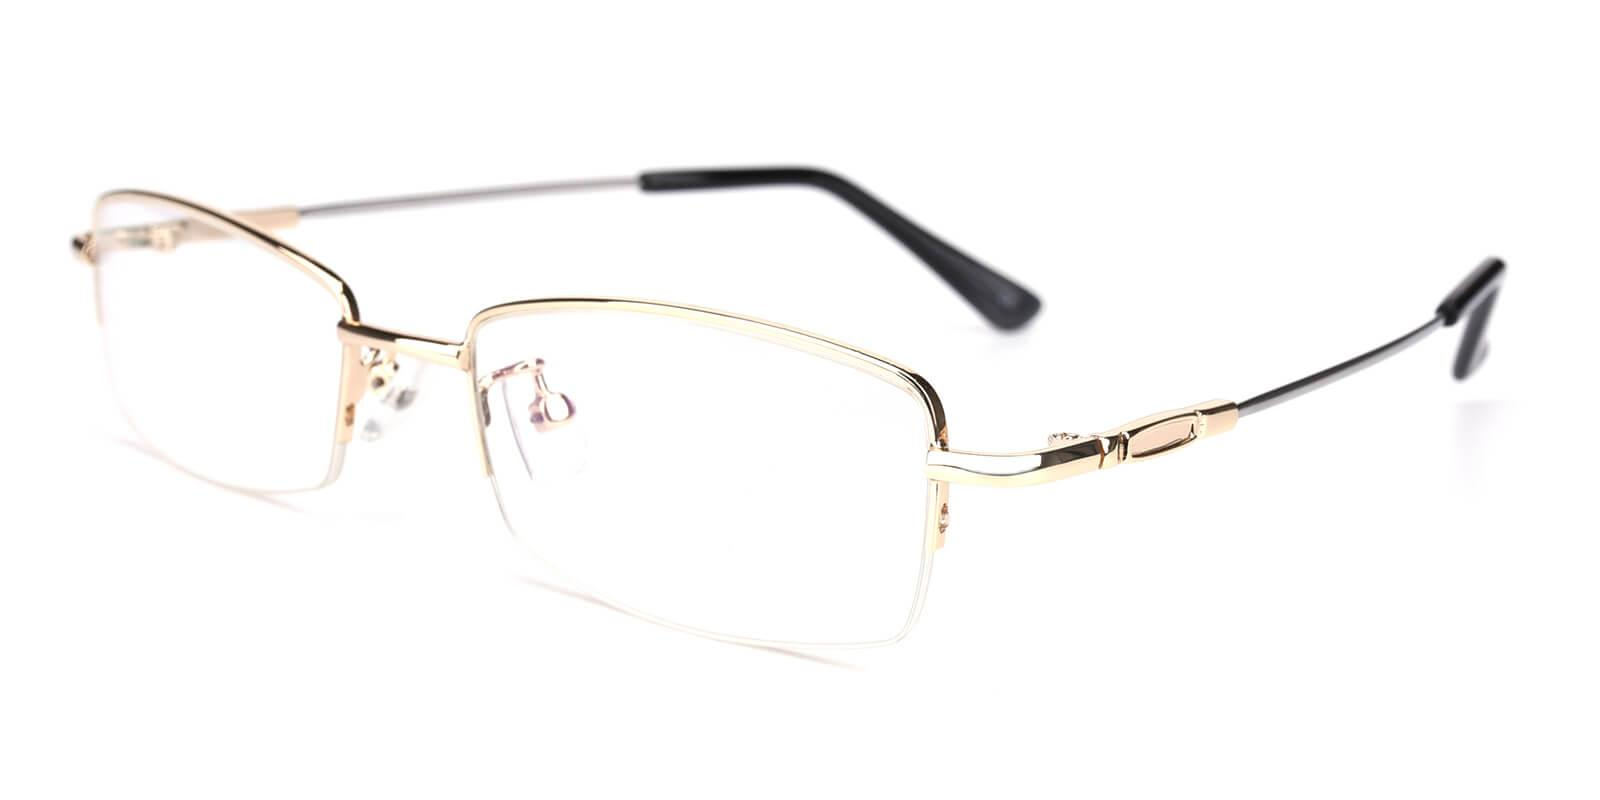 Healdton-Gold-Rectangle-Metal-Eyeglasses-additional1